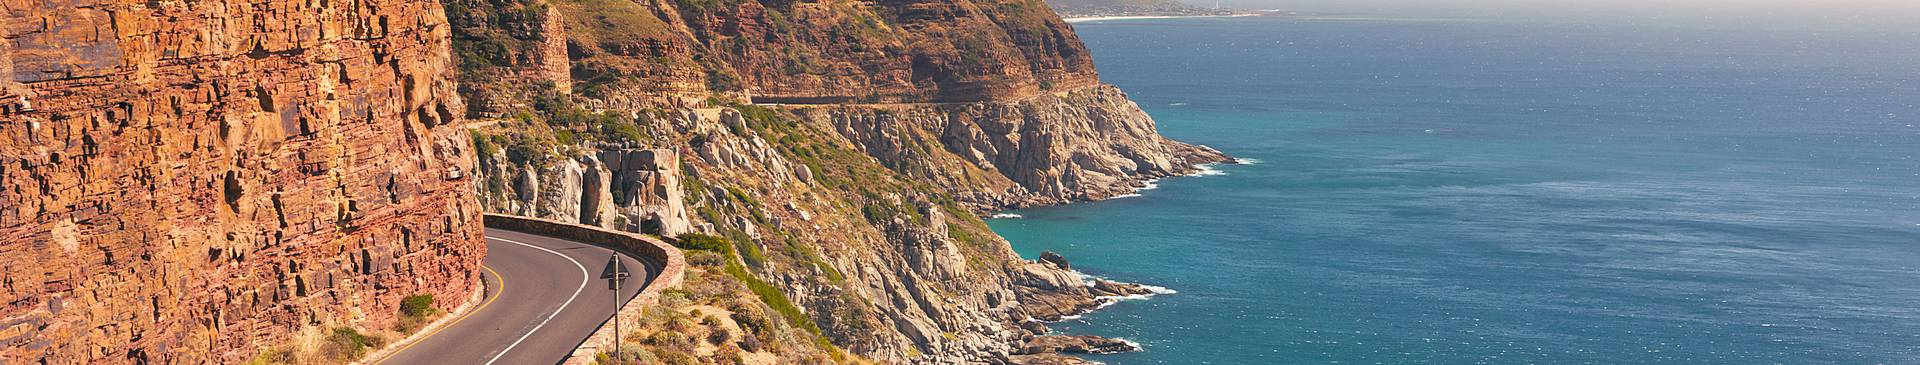 Rutas en coche por Sudáfrica